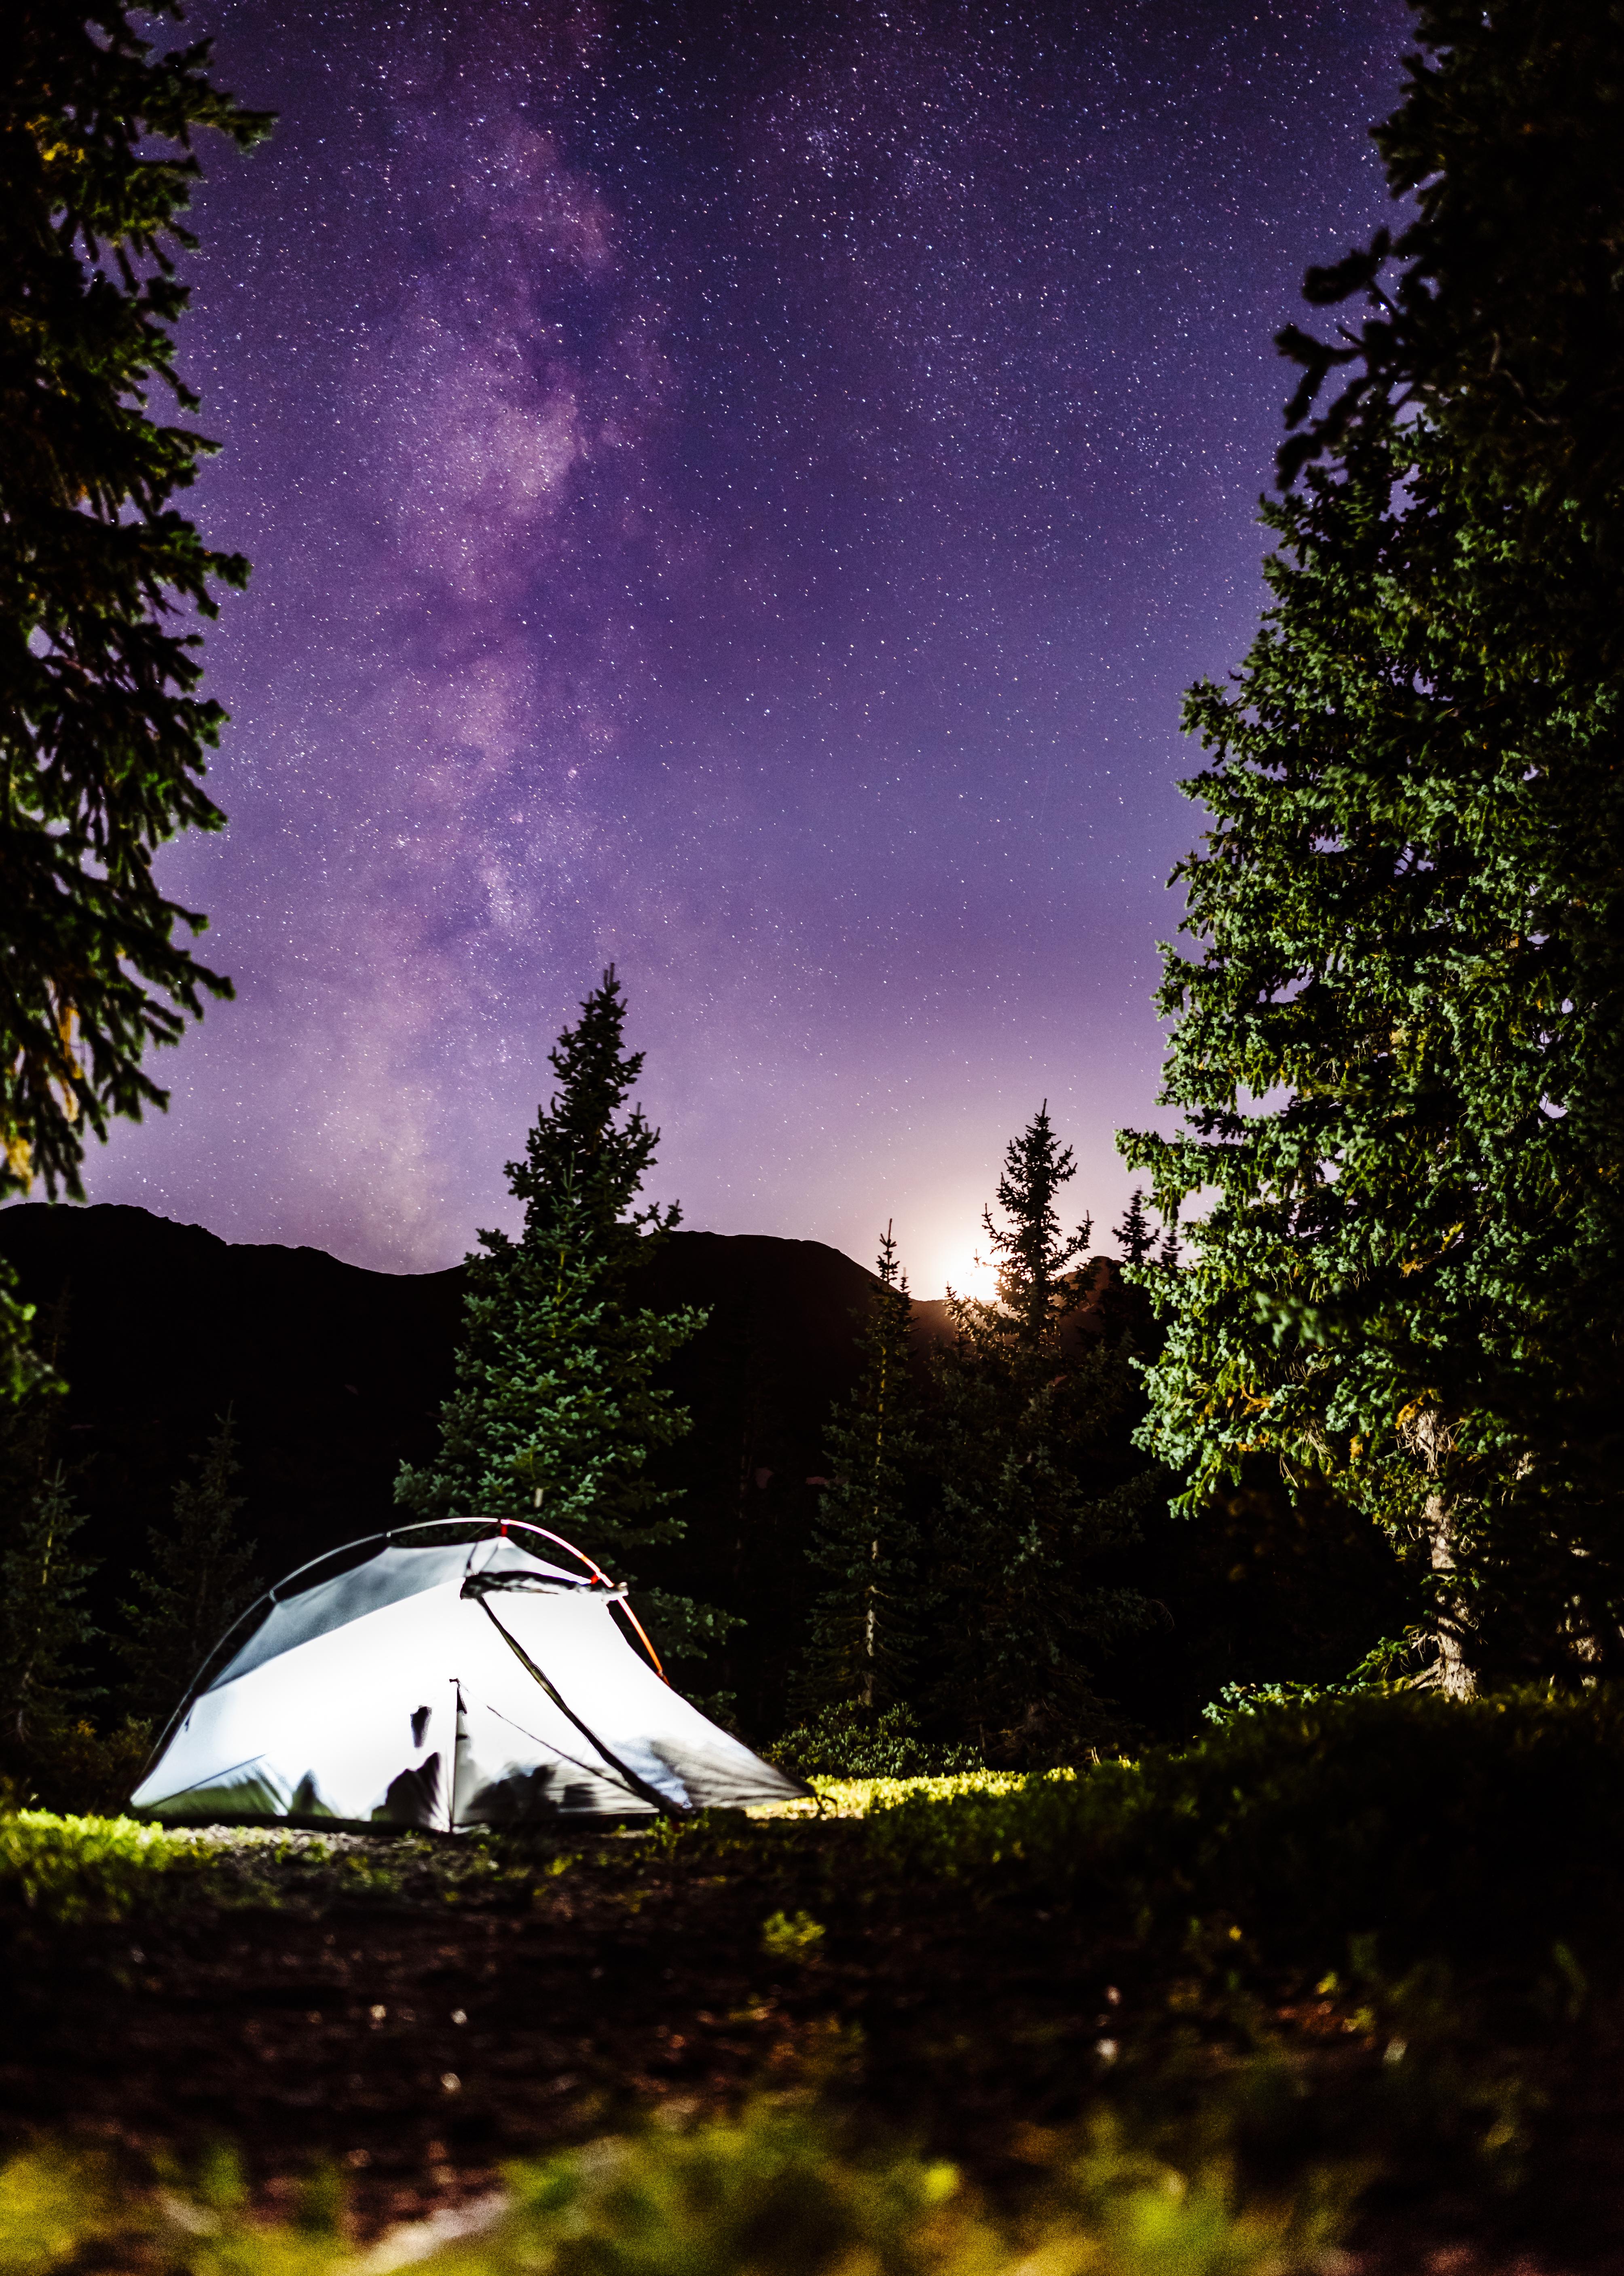 Camping up high